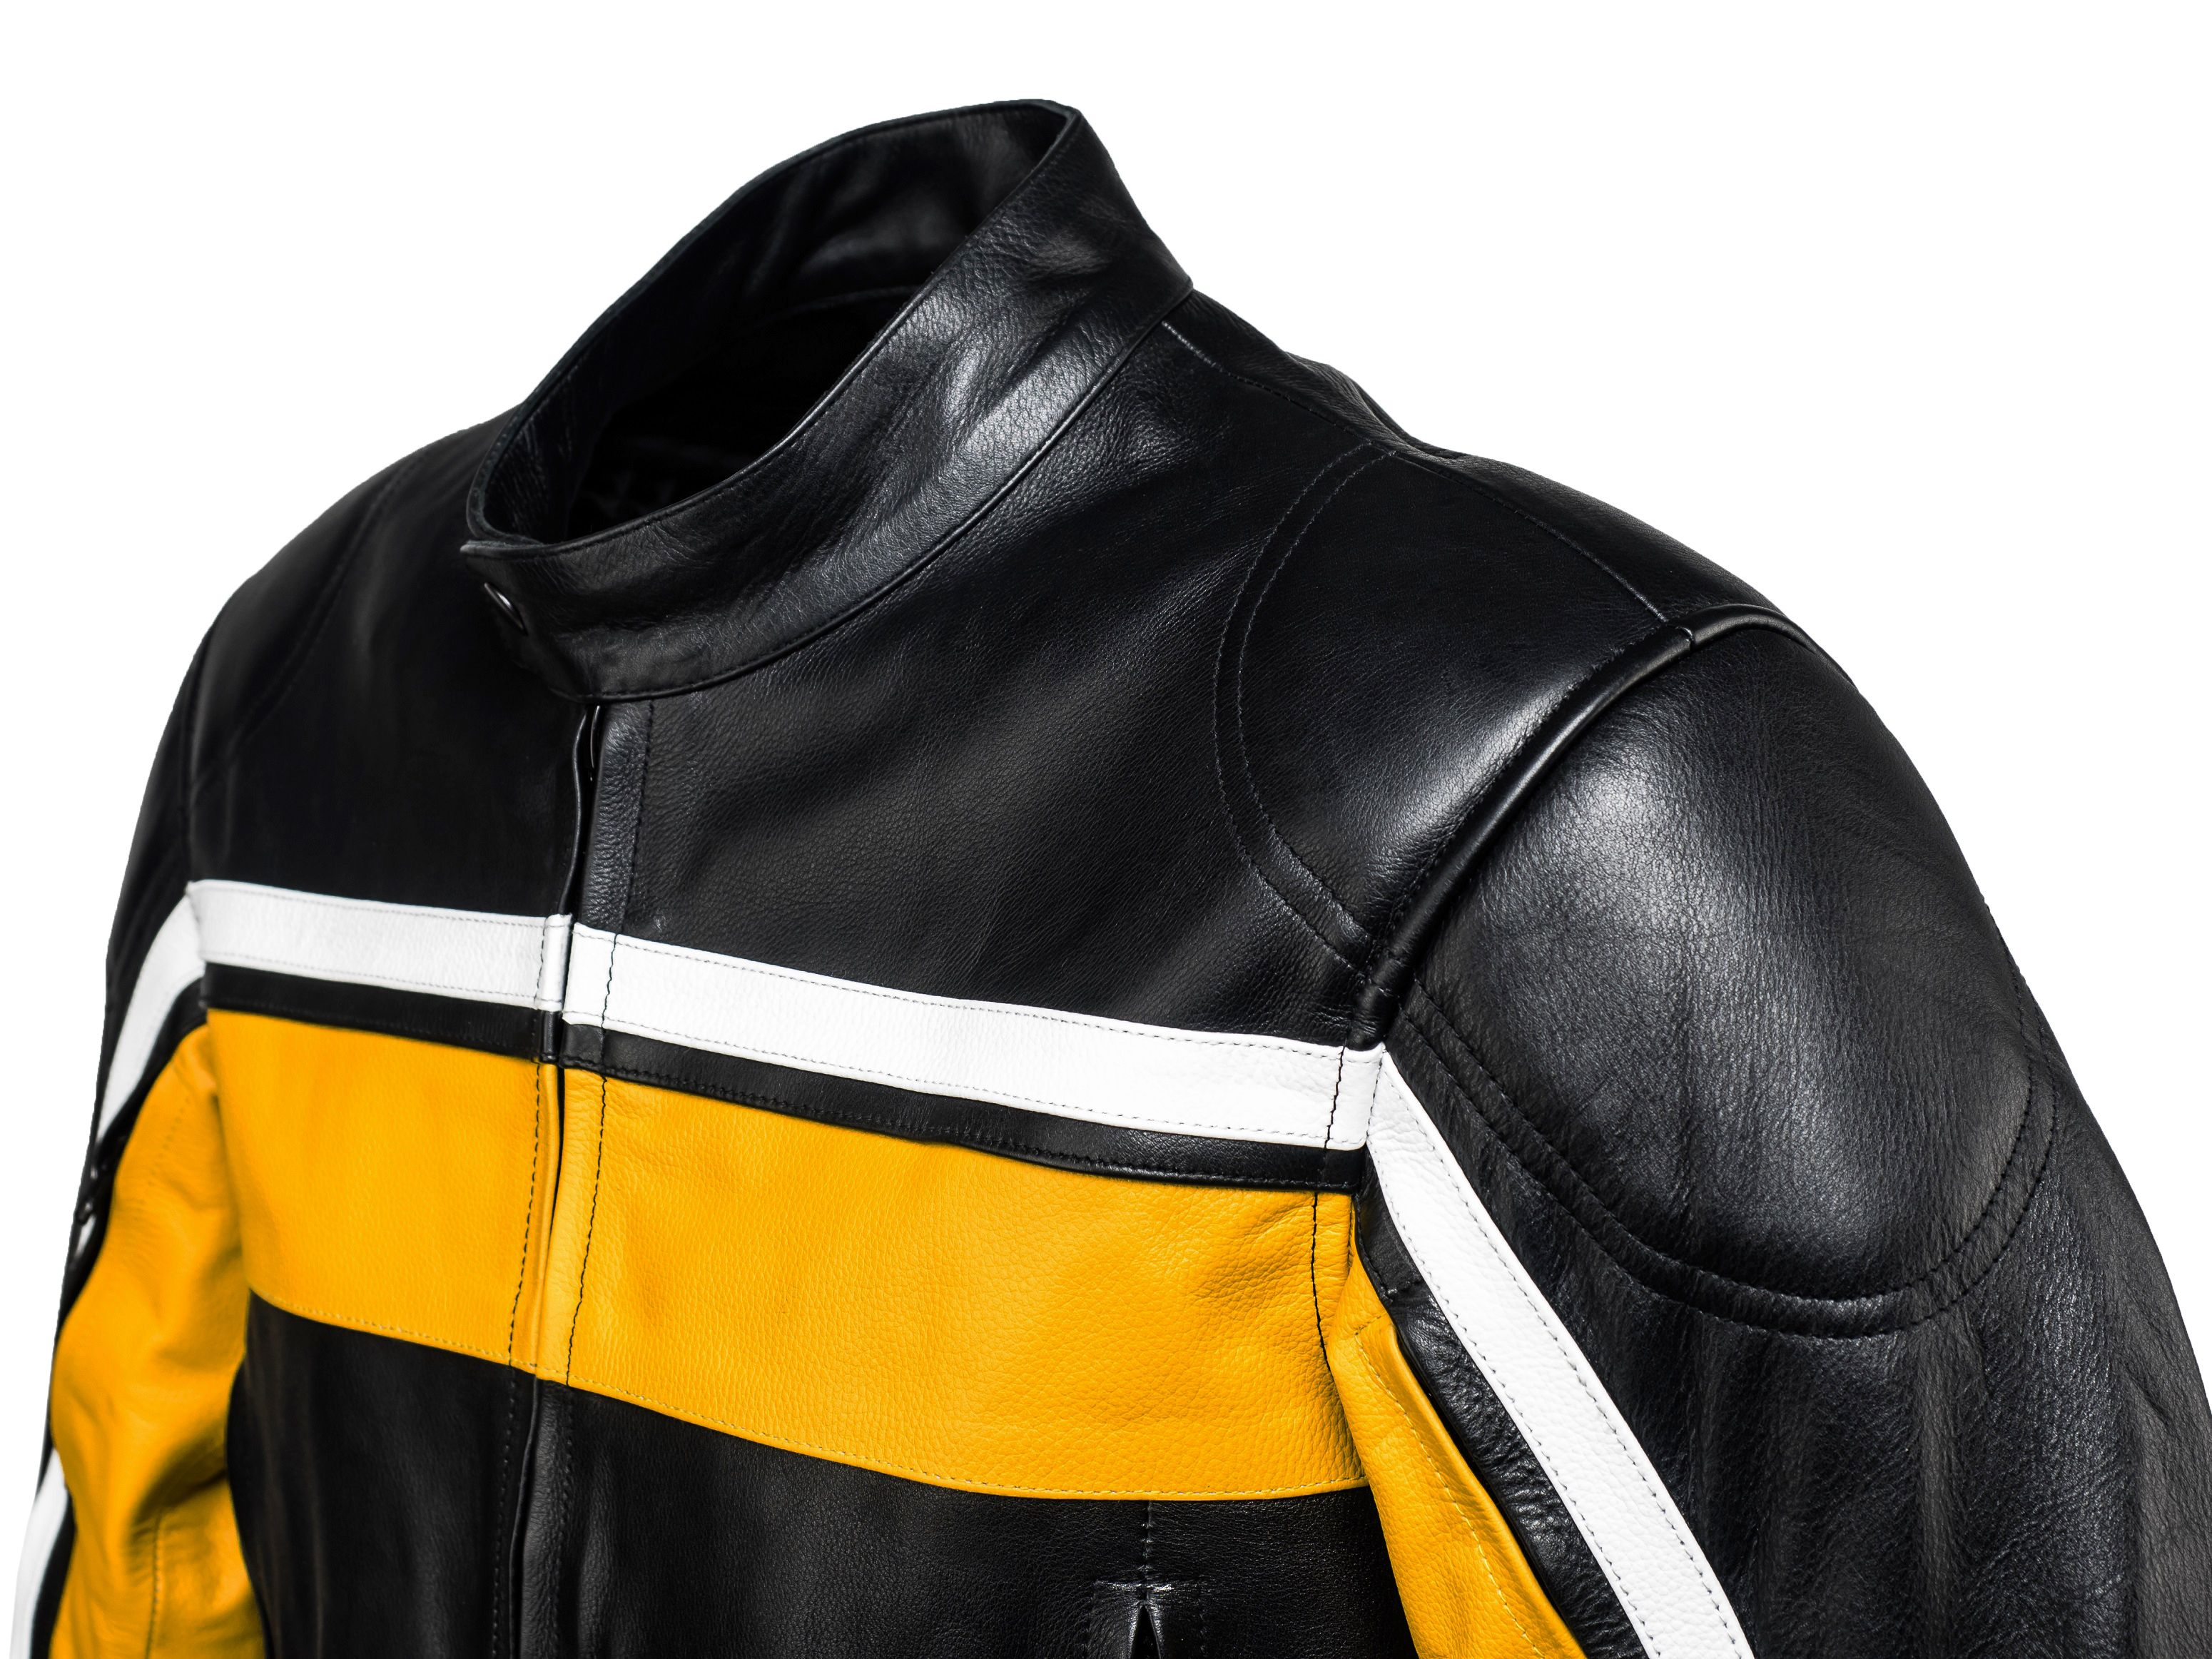 Legacy Classic Black Yellow Motorcycle Leather Jacket By Speedfireusa Motorcycle Racing Jacket Jackets Leather Motorcycle Jacket [ 2325 x 3100 Pixel ]